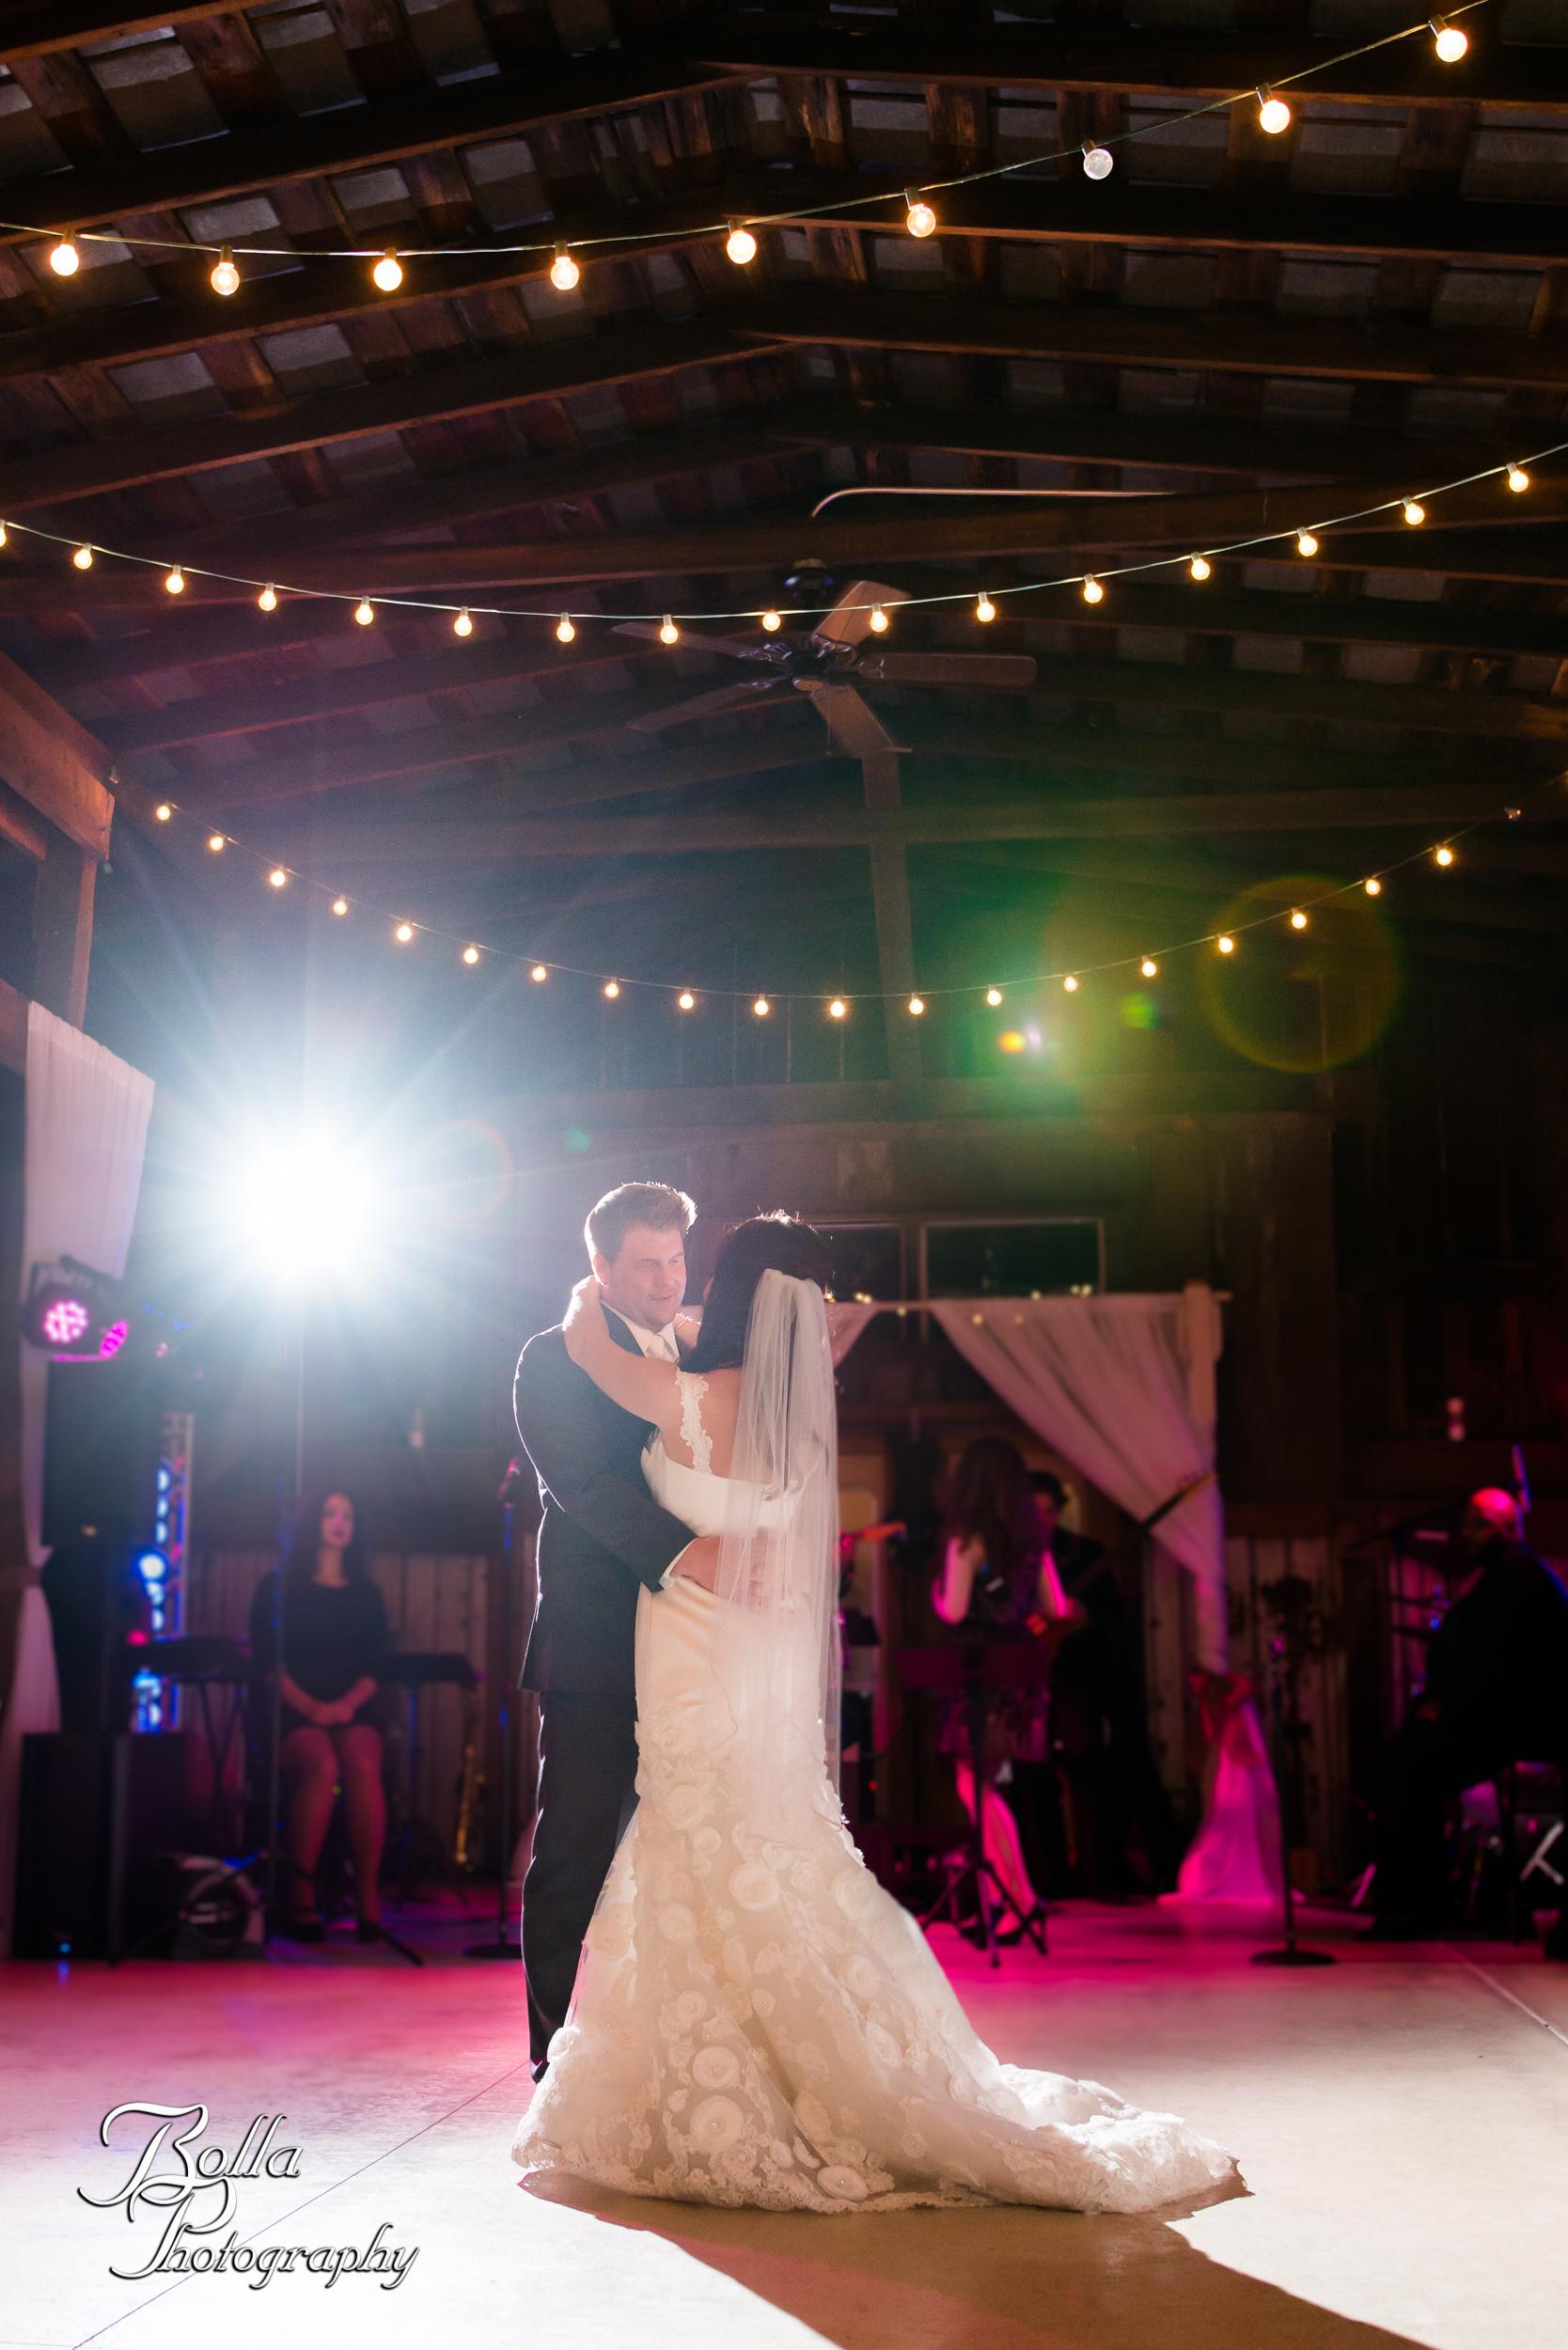 Bolla_photography_edwardsville_wedding_photographer_st_louis_weddings_Reilmann-0484.jpg